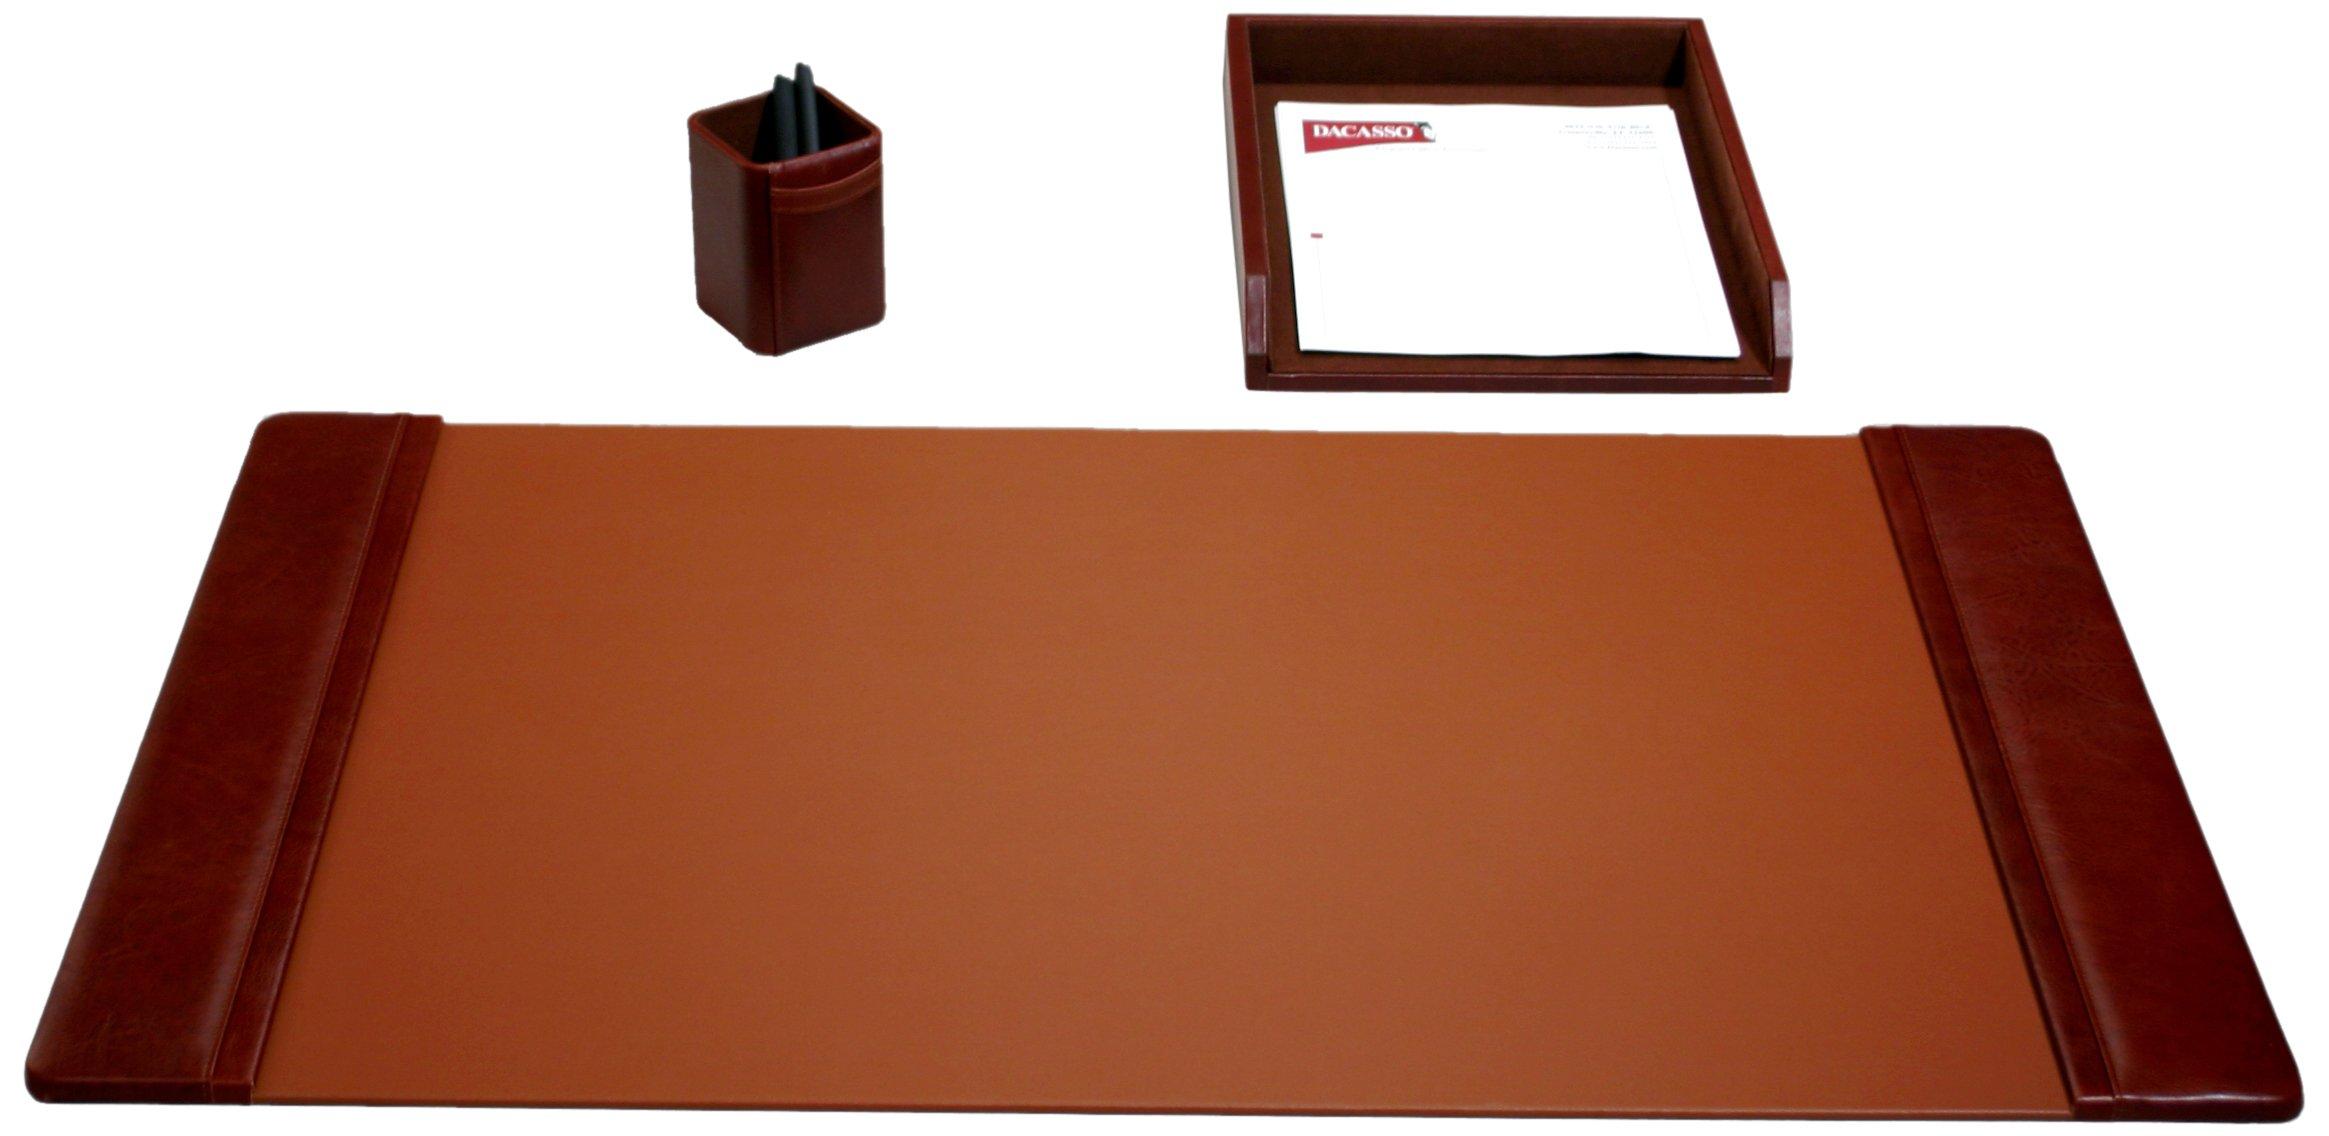 Dacasso Leather Desk Set, 3-Piece, Mocha